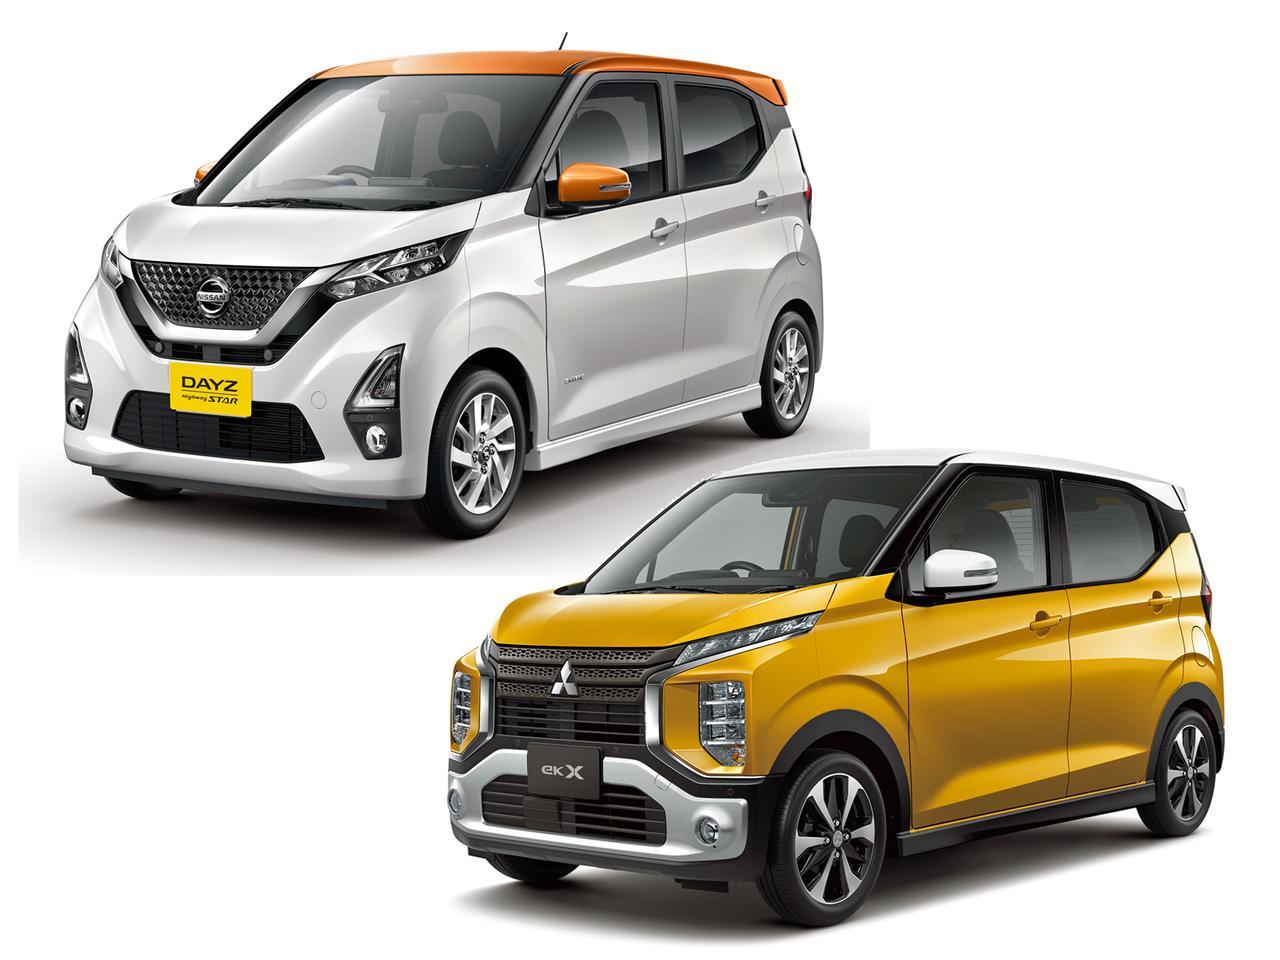 Images : 1番目の画像 - 日産と三菱の新型軽自動車 - Webモーターマガジン